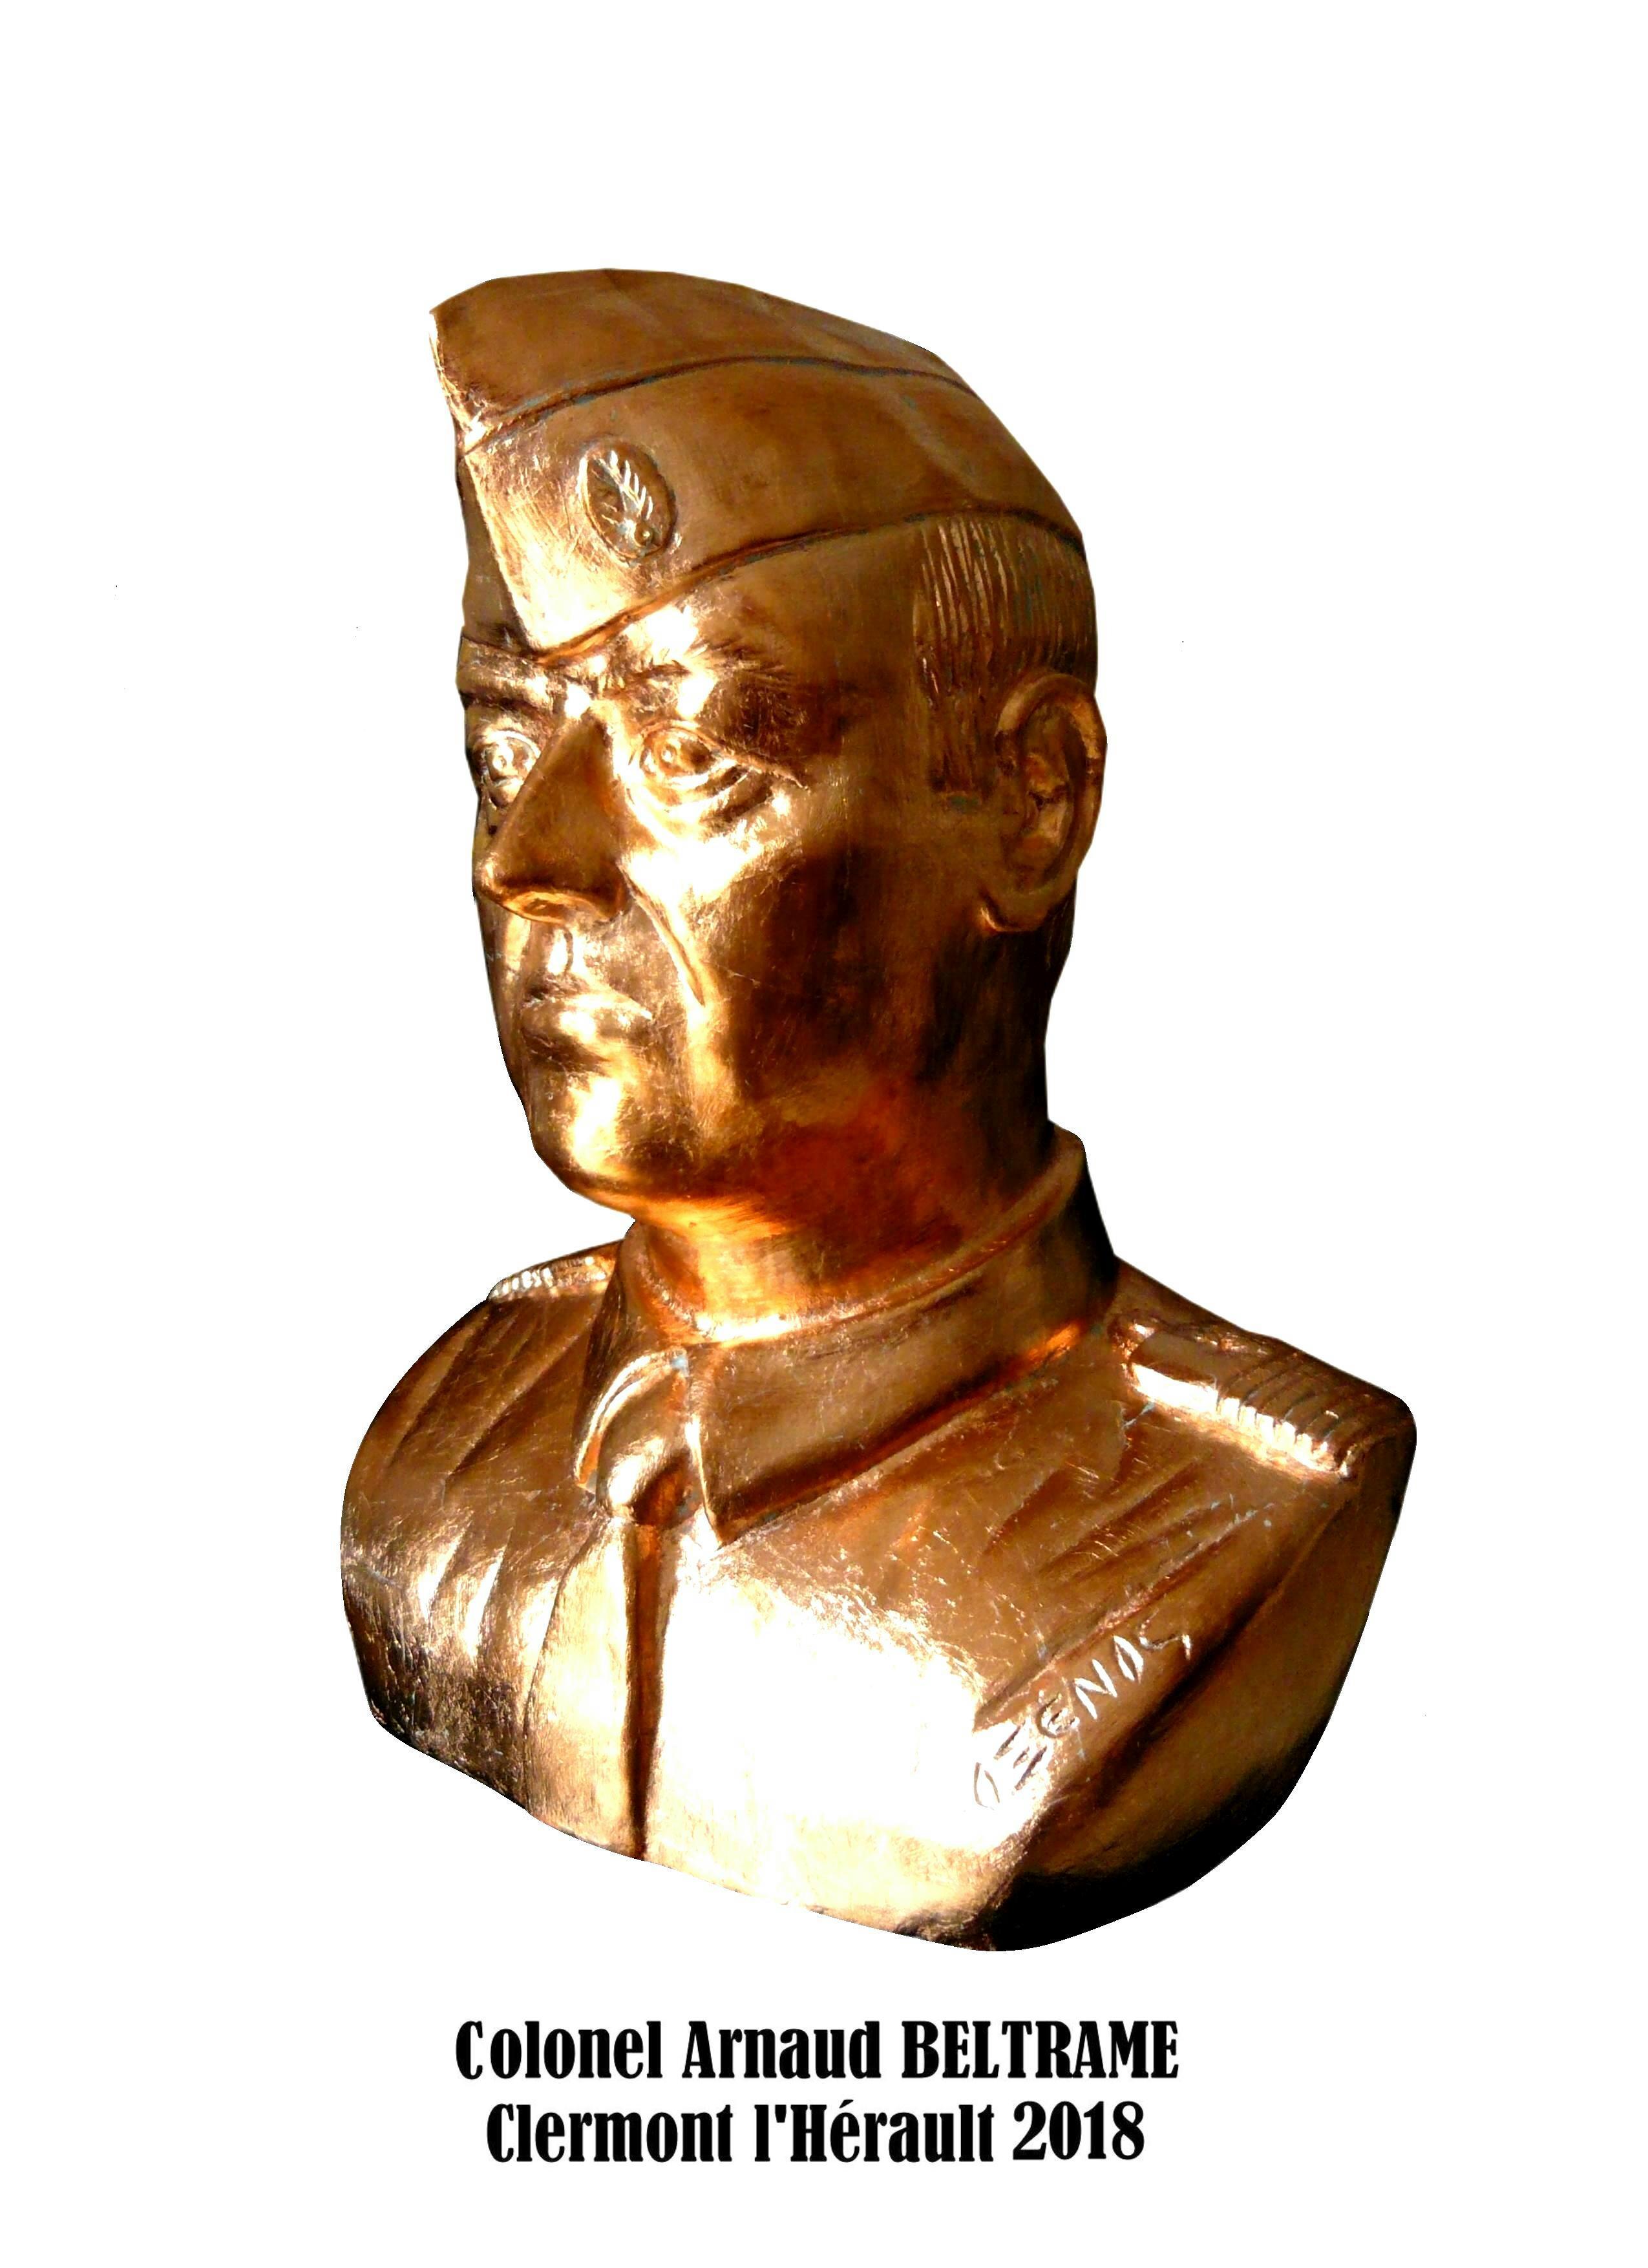 Colonel Arnaud BELTRAME 1